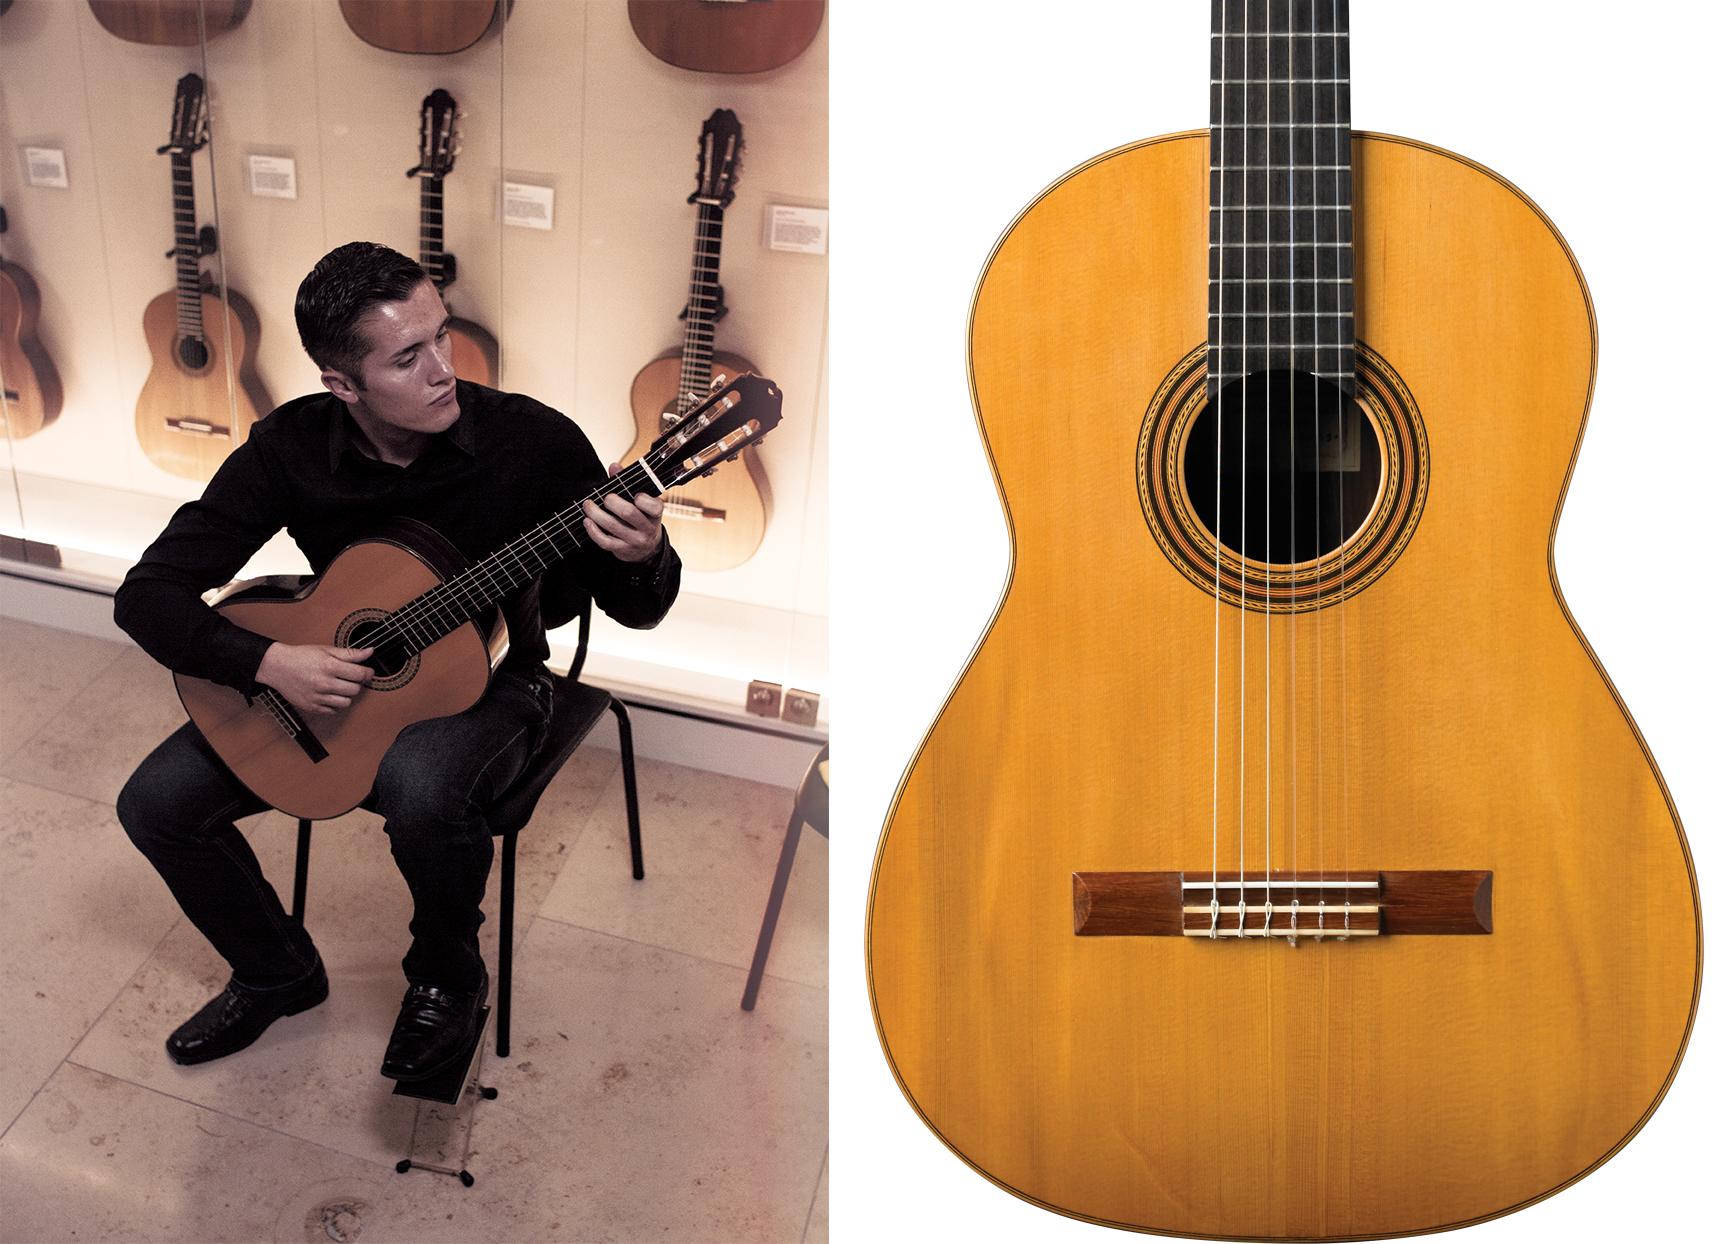 Harris Collection Guitars, Nathan Martinez plays the Masaru Kohno 1976 and the 1930 Santos Hernández guitar